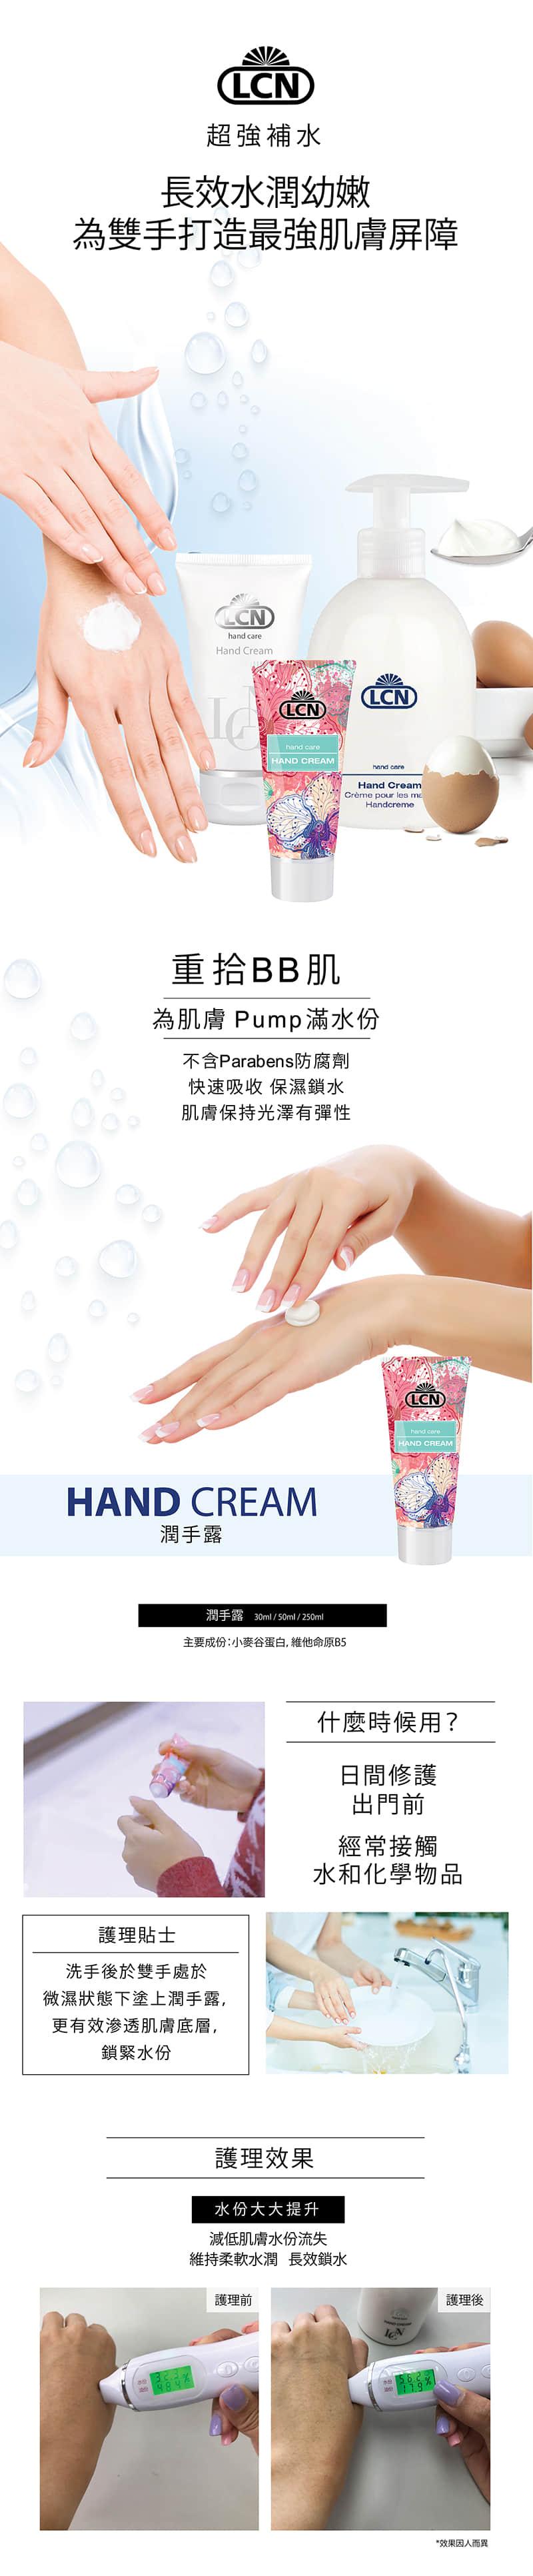 hand_Cream_banner-01_2.jpg